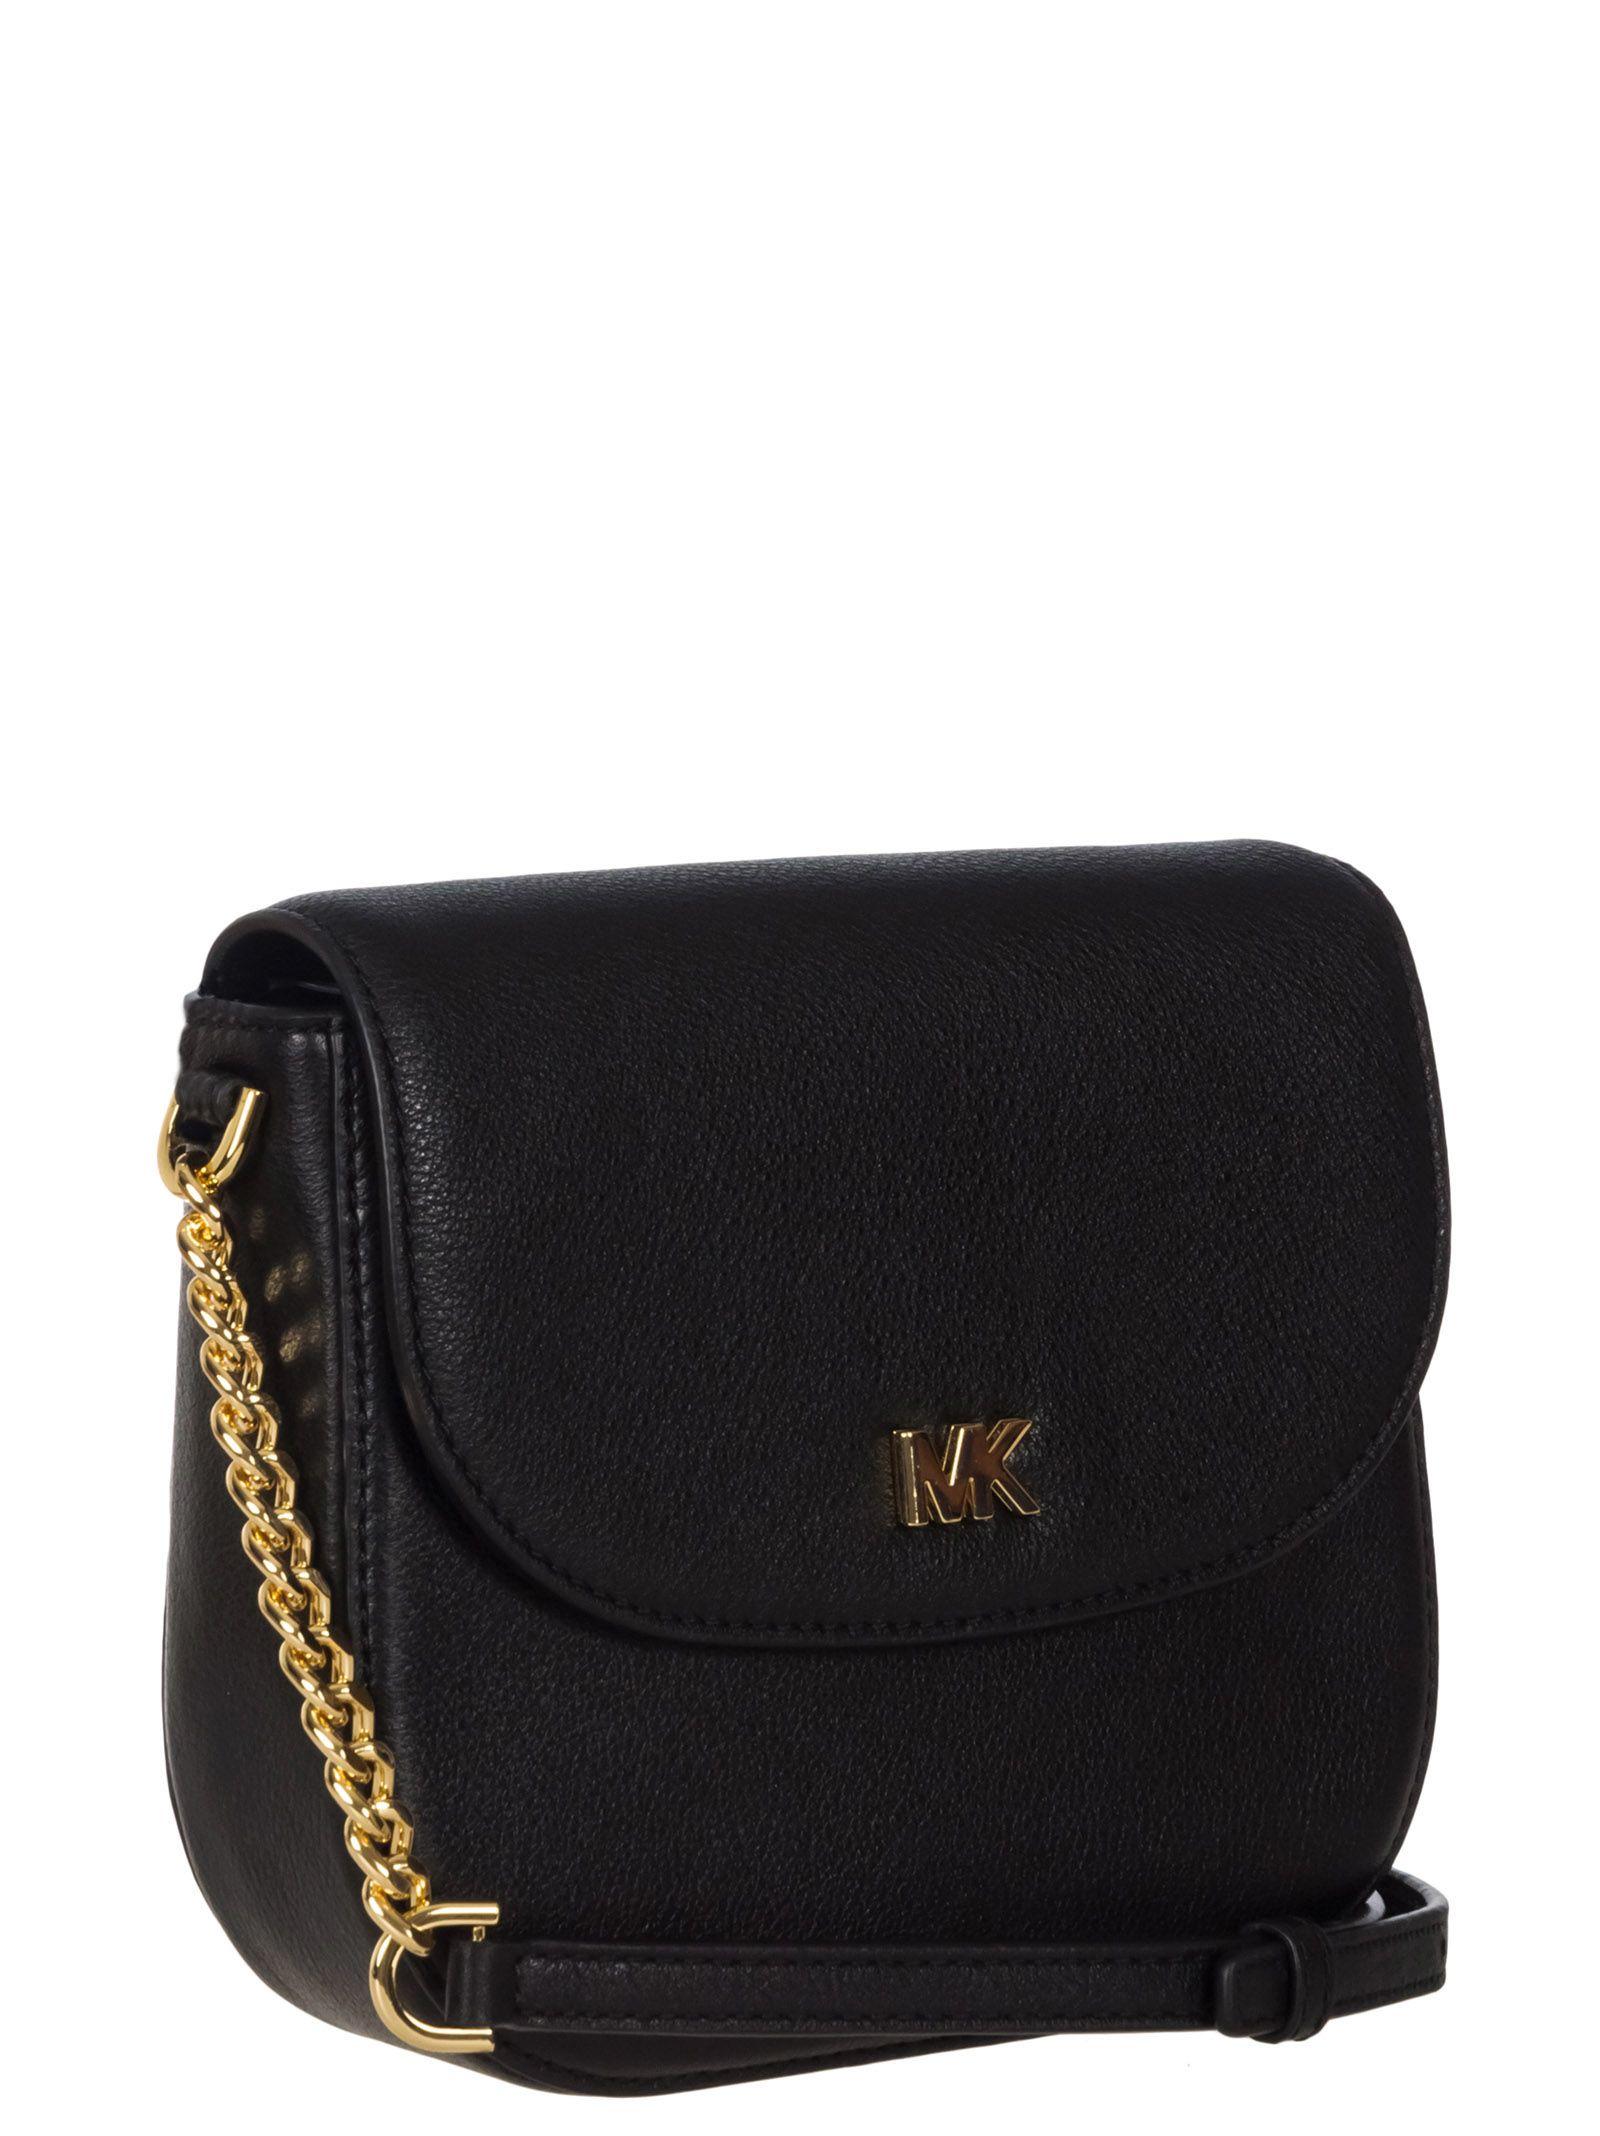 03a4cdc64d Michael Kors Michael Kors Leather Crossbody Bag - Black - 10857614 ...